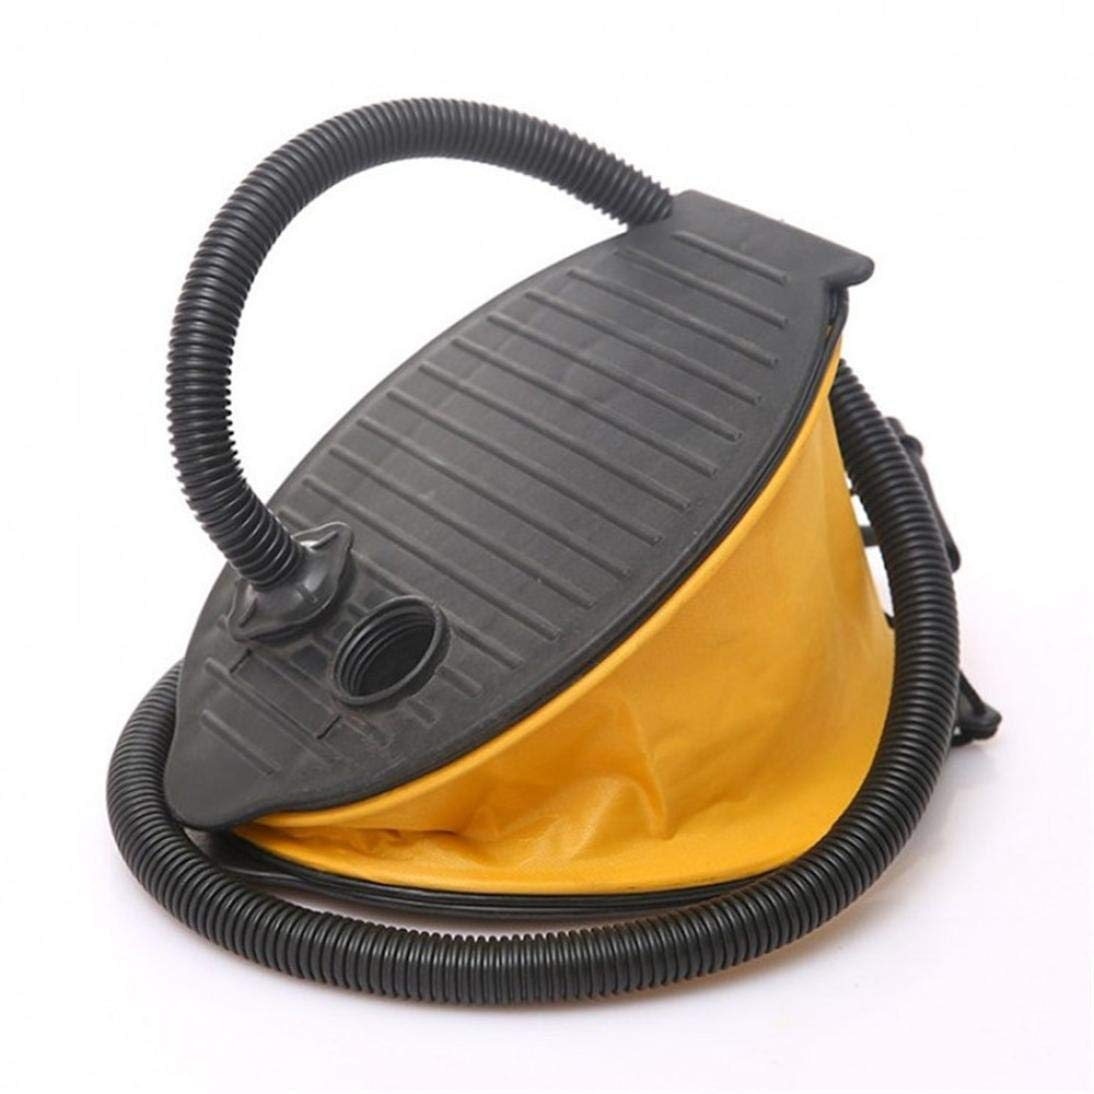 Bellows Foot Pump, Sacow Collapsible Bellow Foot Air Pump for Camping Air Mattress Bed Pad Mat